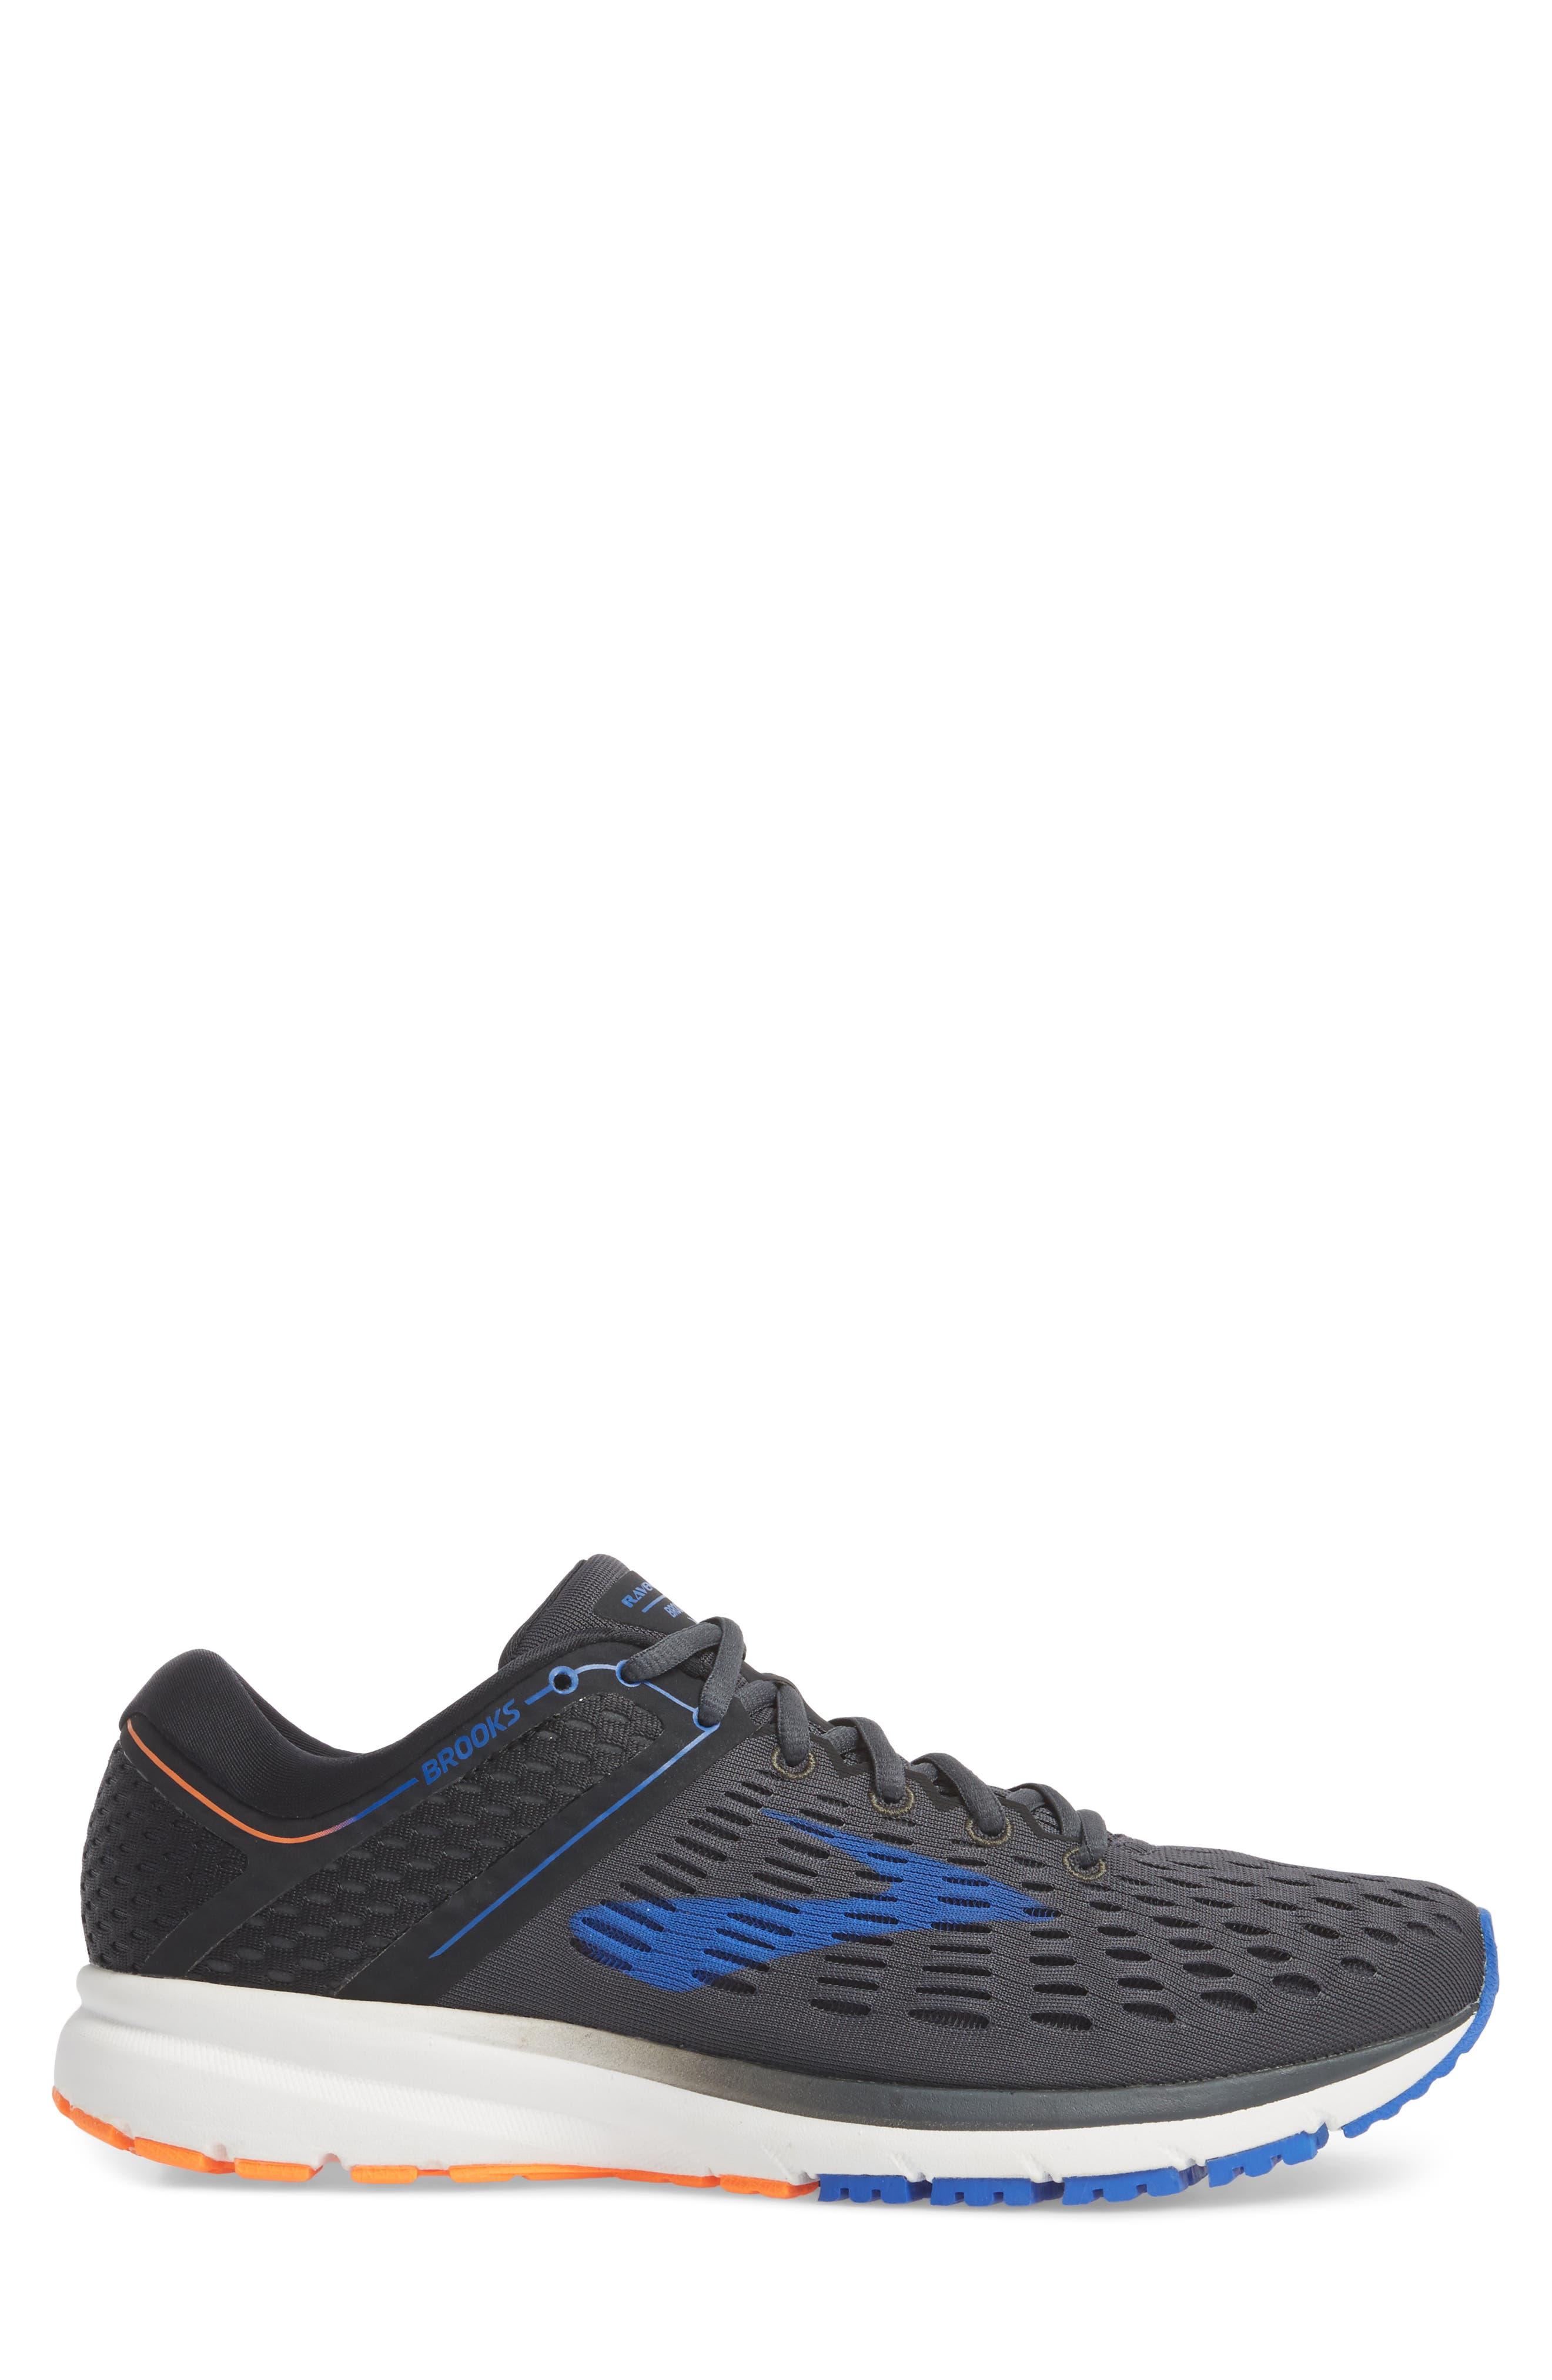 Ravenna 9 Running Shoe,                             Alternate thumbnail 3, color,                             EBONY/ BLUE/ ORANGE